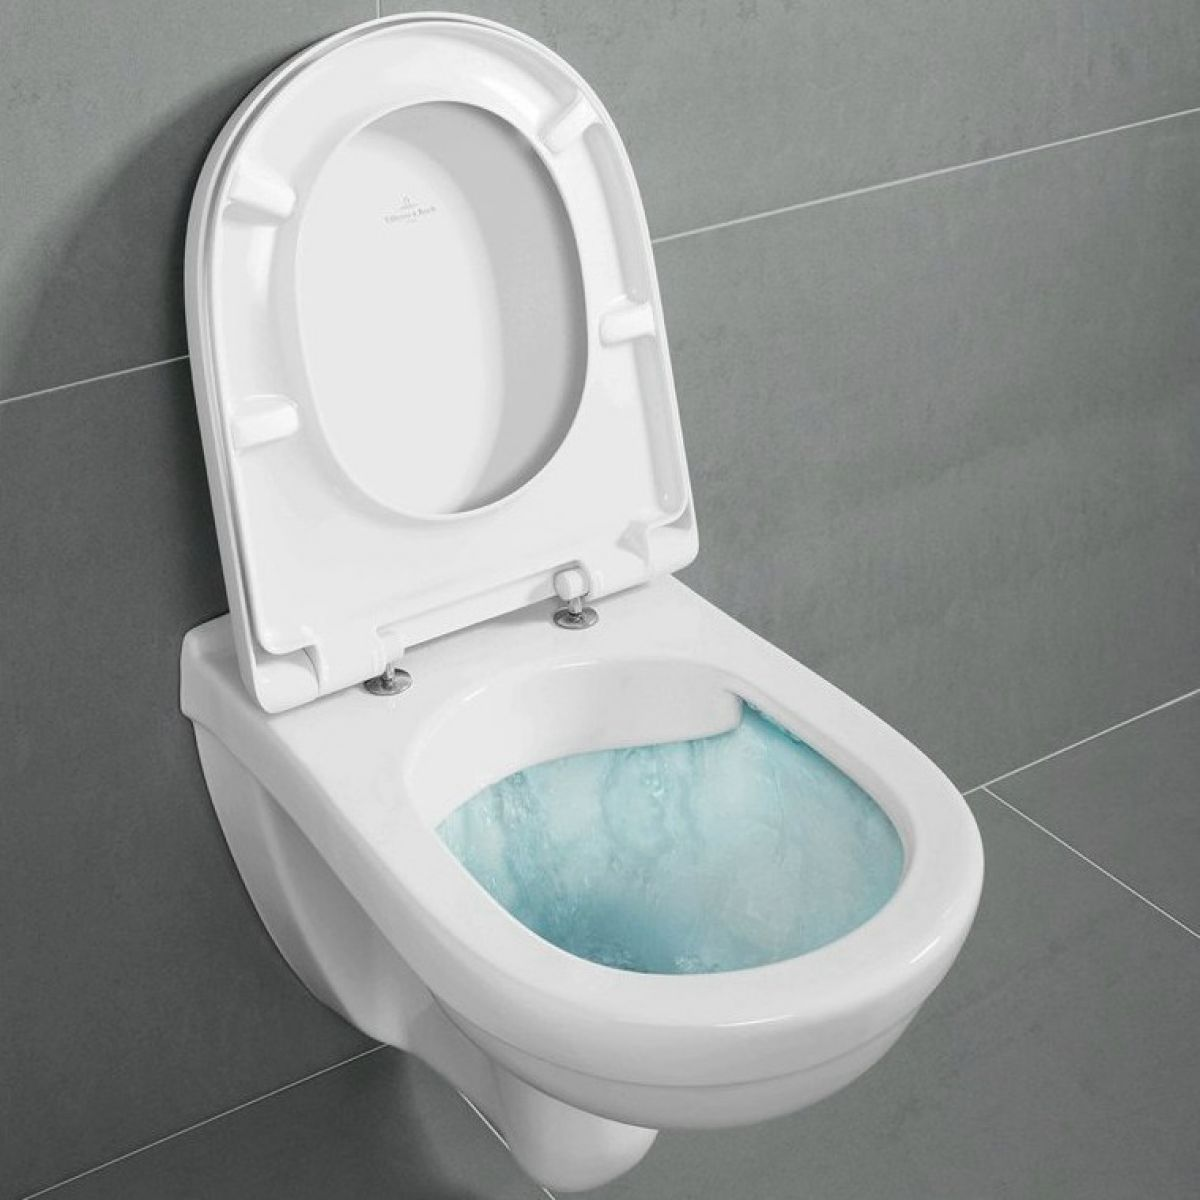 villeroy boch o novo rimless wall hung wc uk bathrooms. Black Bedroom Furniture Sets. Home Design Ideas